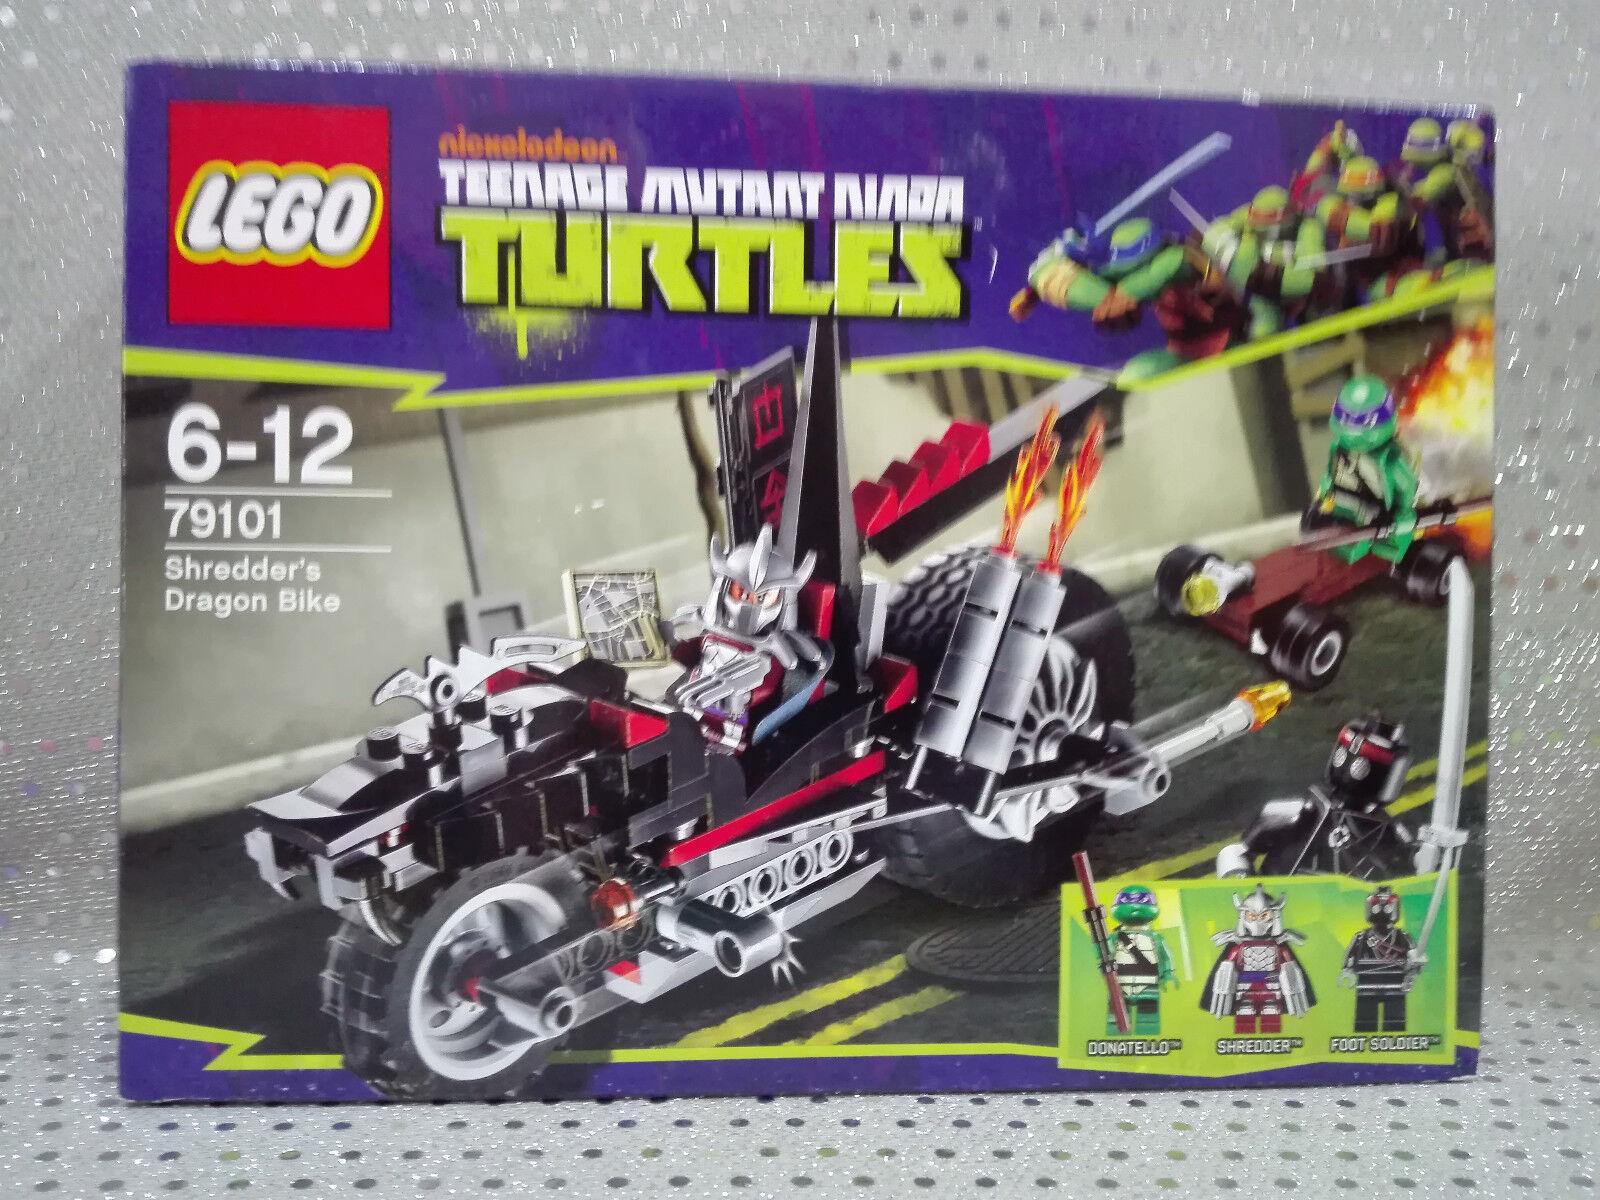 Lego 79101 Teenage Mutant Ninja Turtles Turtles Turtles Tortugas Ninja Sh rojo der´s Dragon Bike.  garantizado